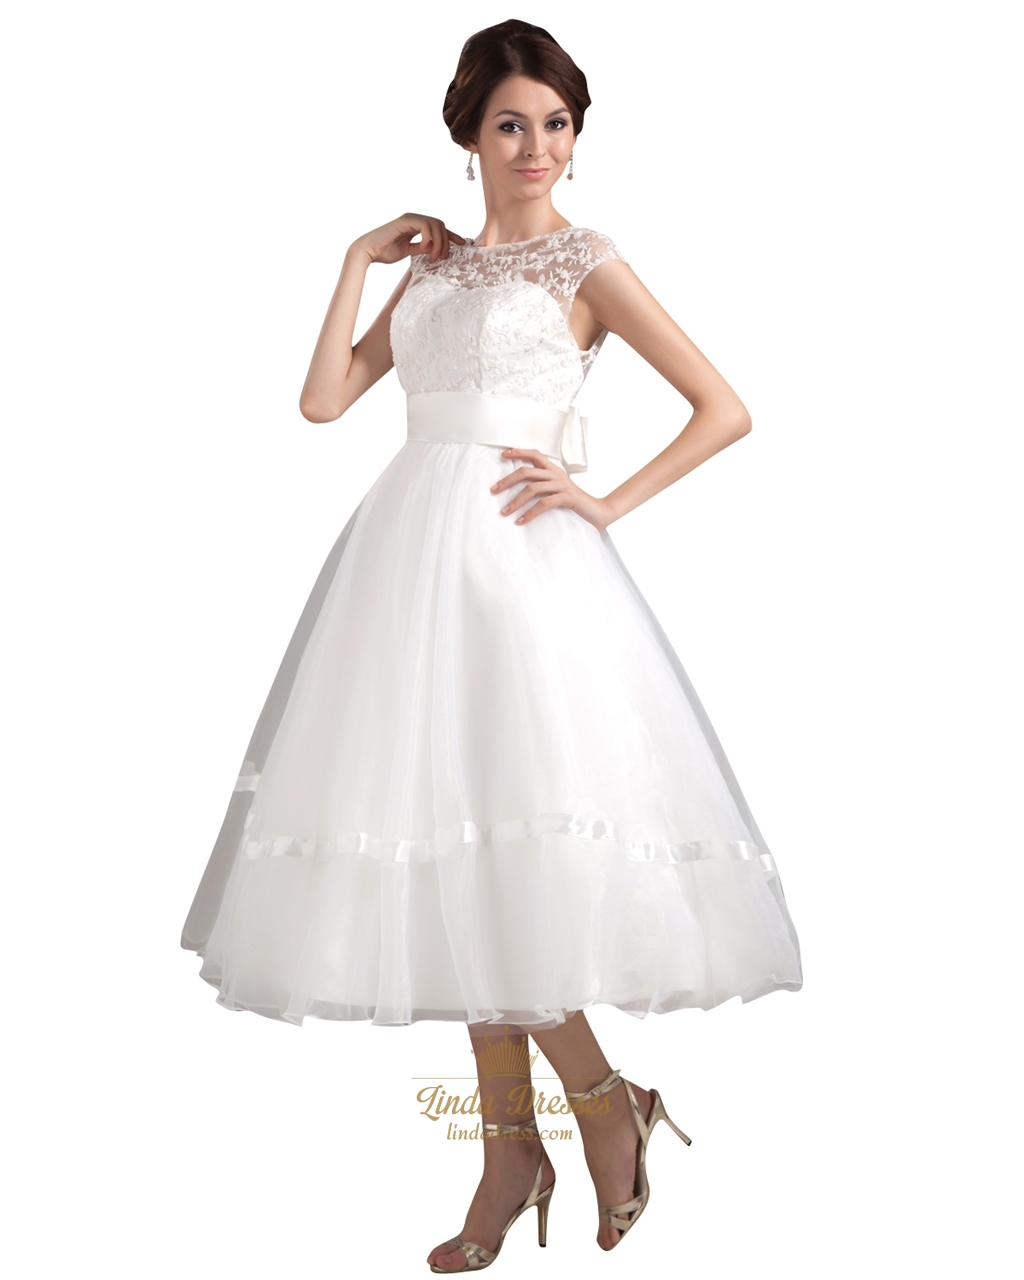 Ivory Illusion Neckline Tea Length Wedding Dress With Cap